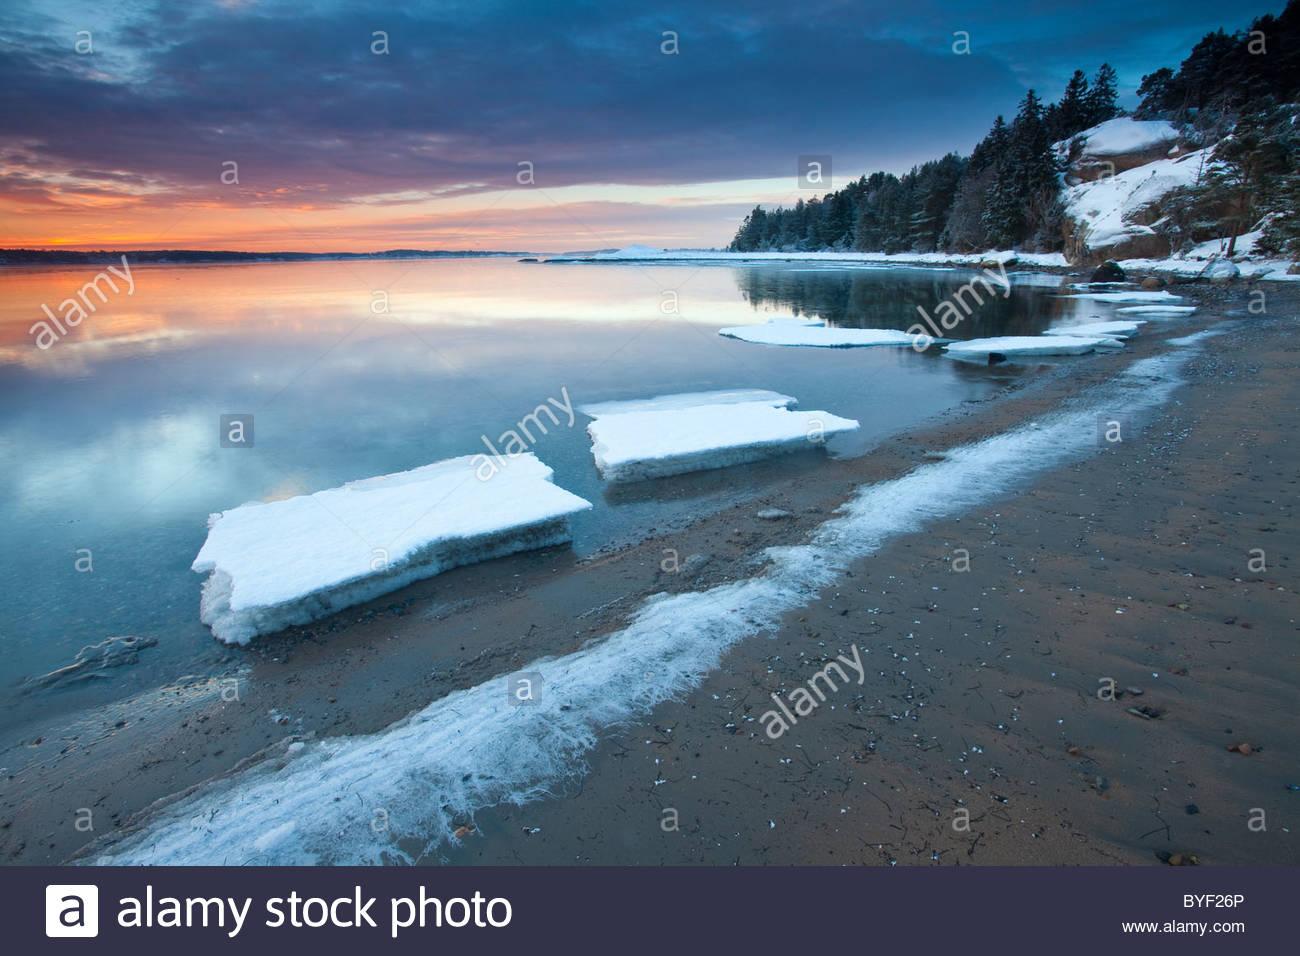 Schönen winter Sonnenaufgang am Oslofjord, im Ofen in Råde, Østfold fylke, Norwegen. Stockbild